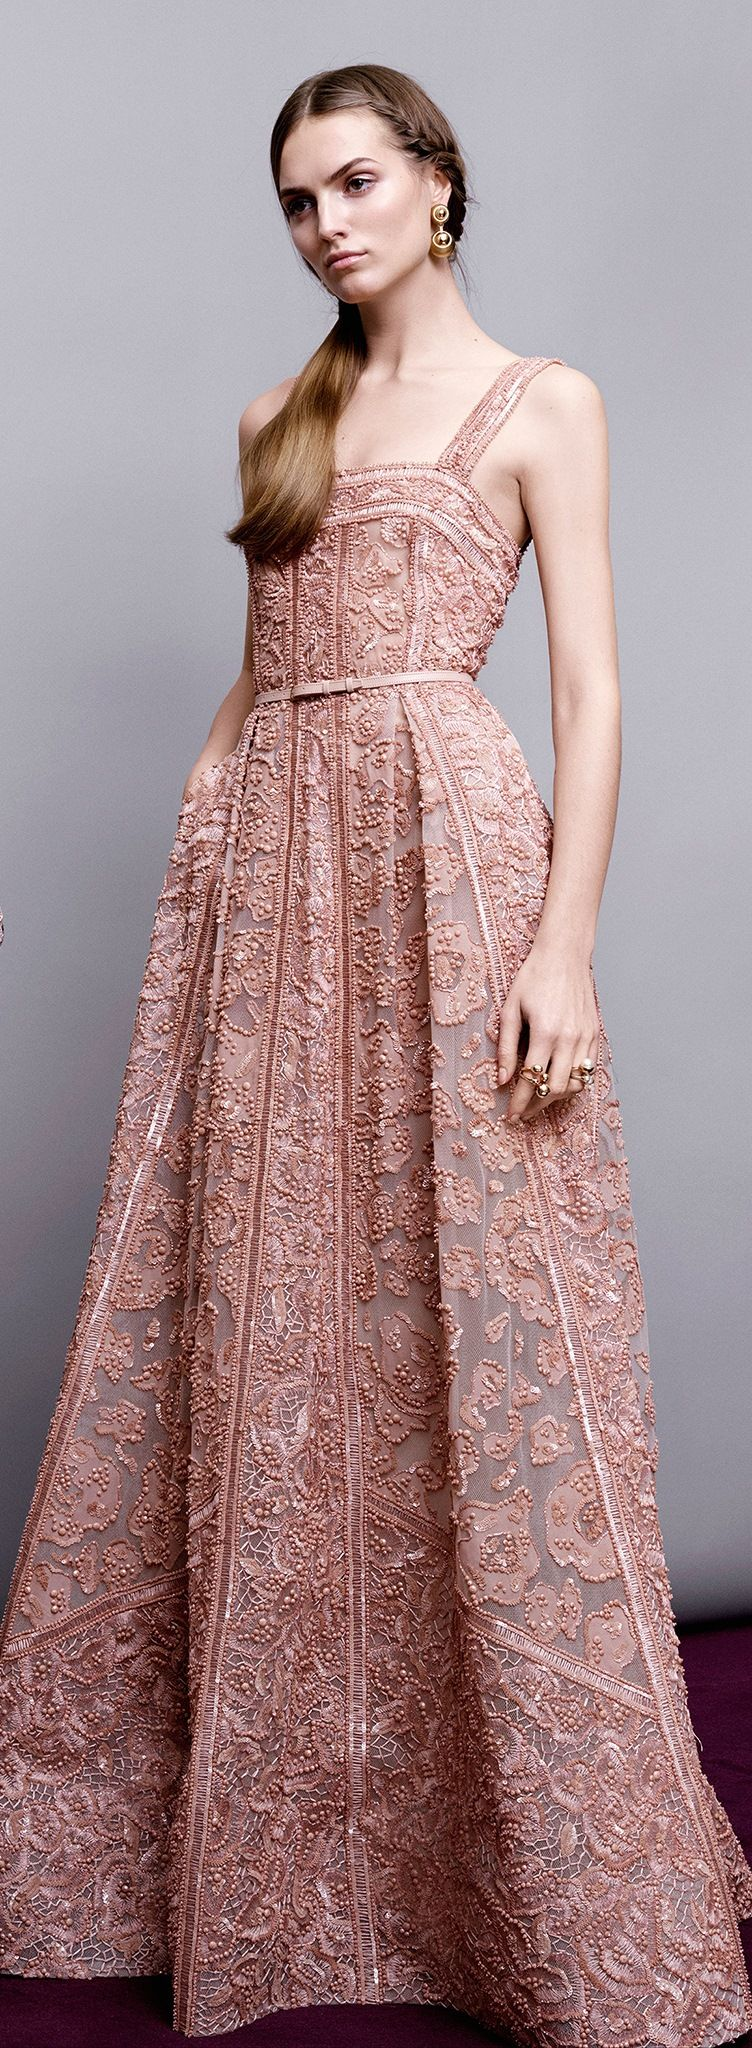 Elie Saab Pre-Fall 2015 | 01. Outfit & Look | Pinterest | Armario de ...